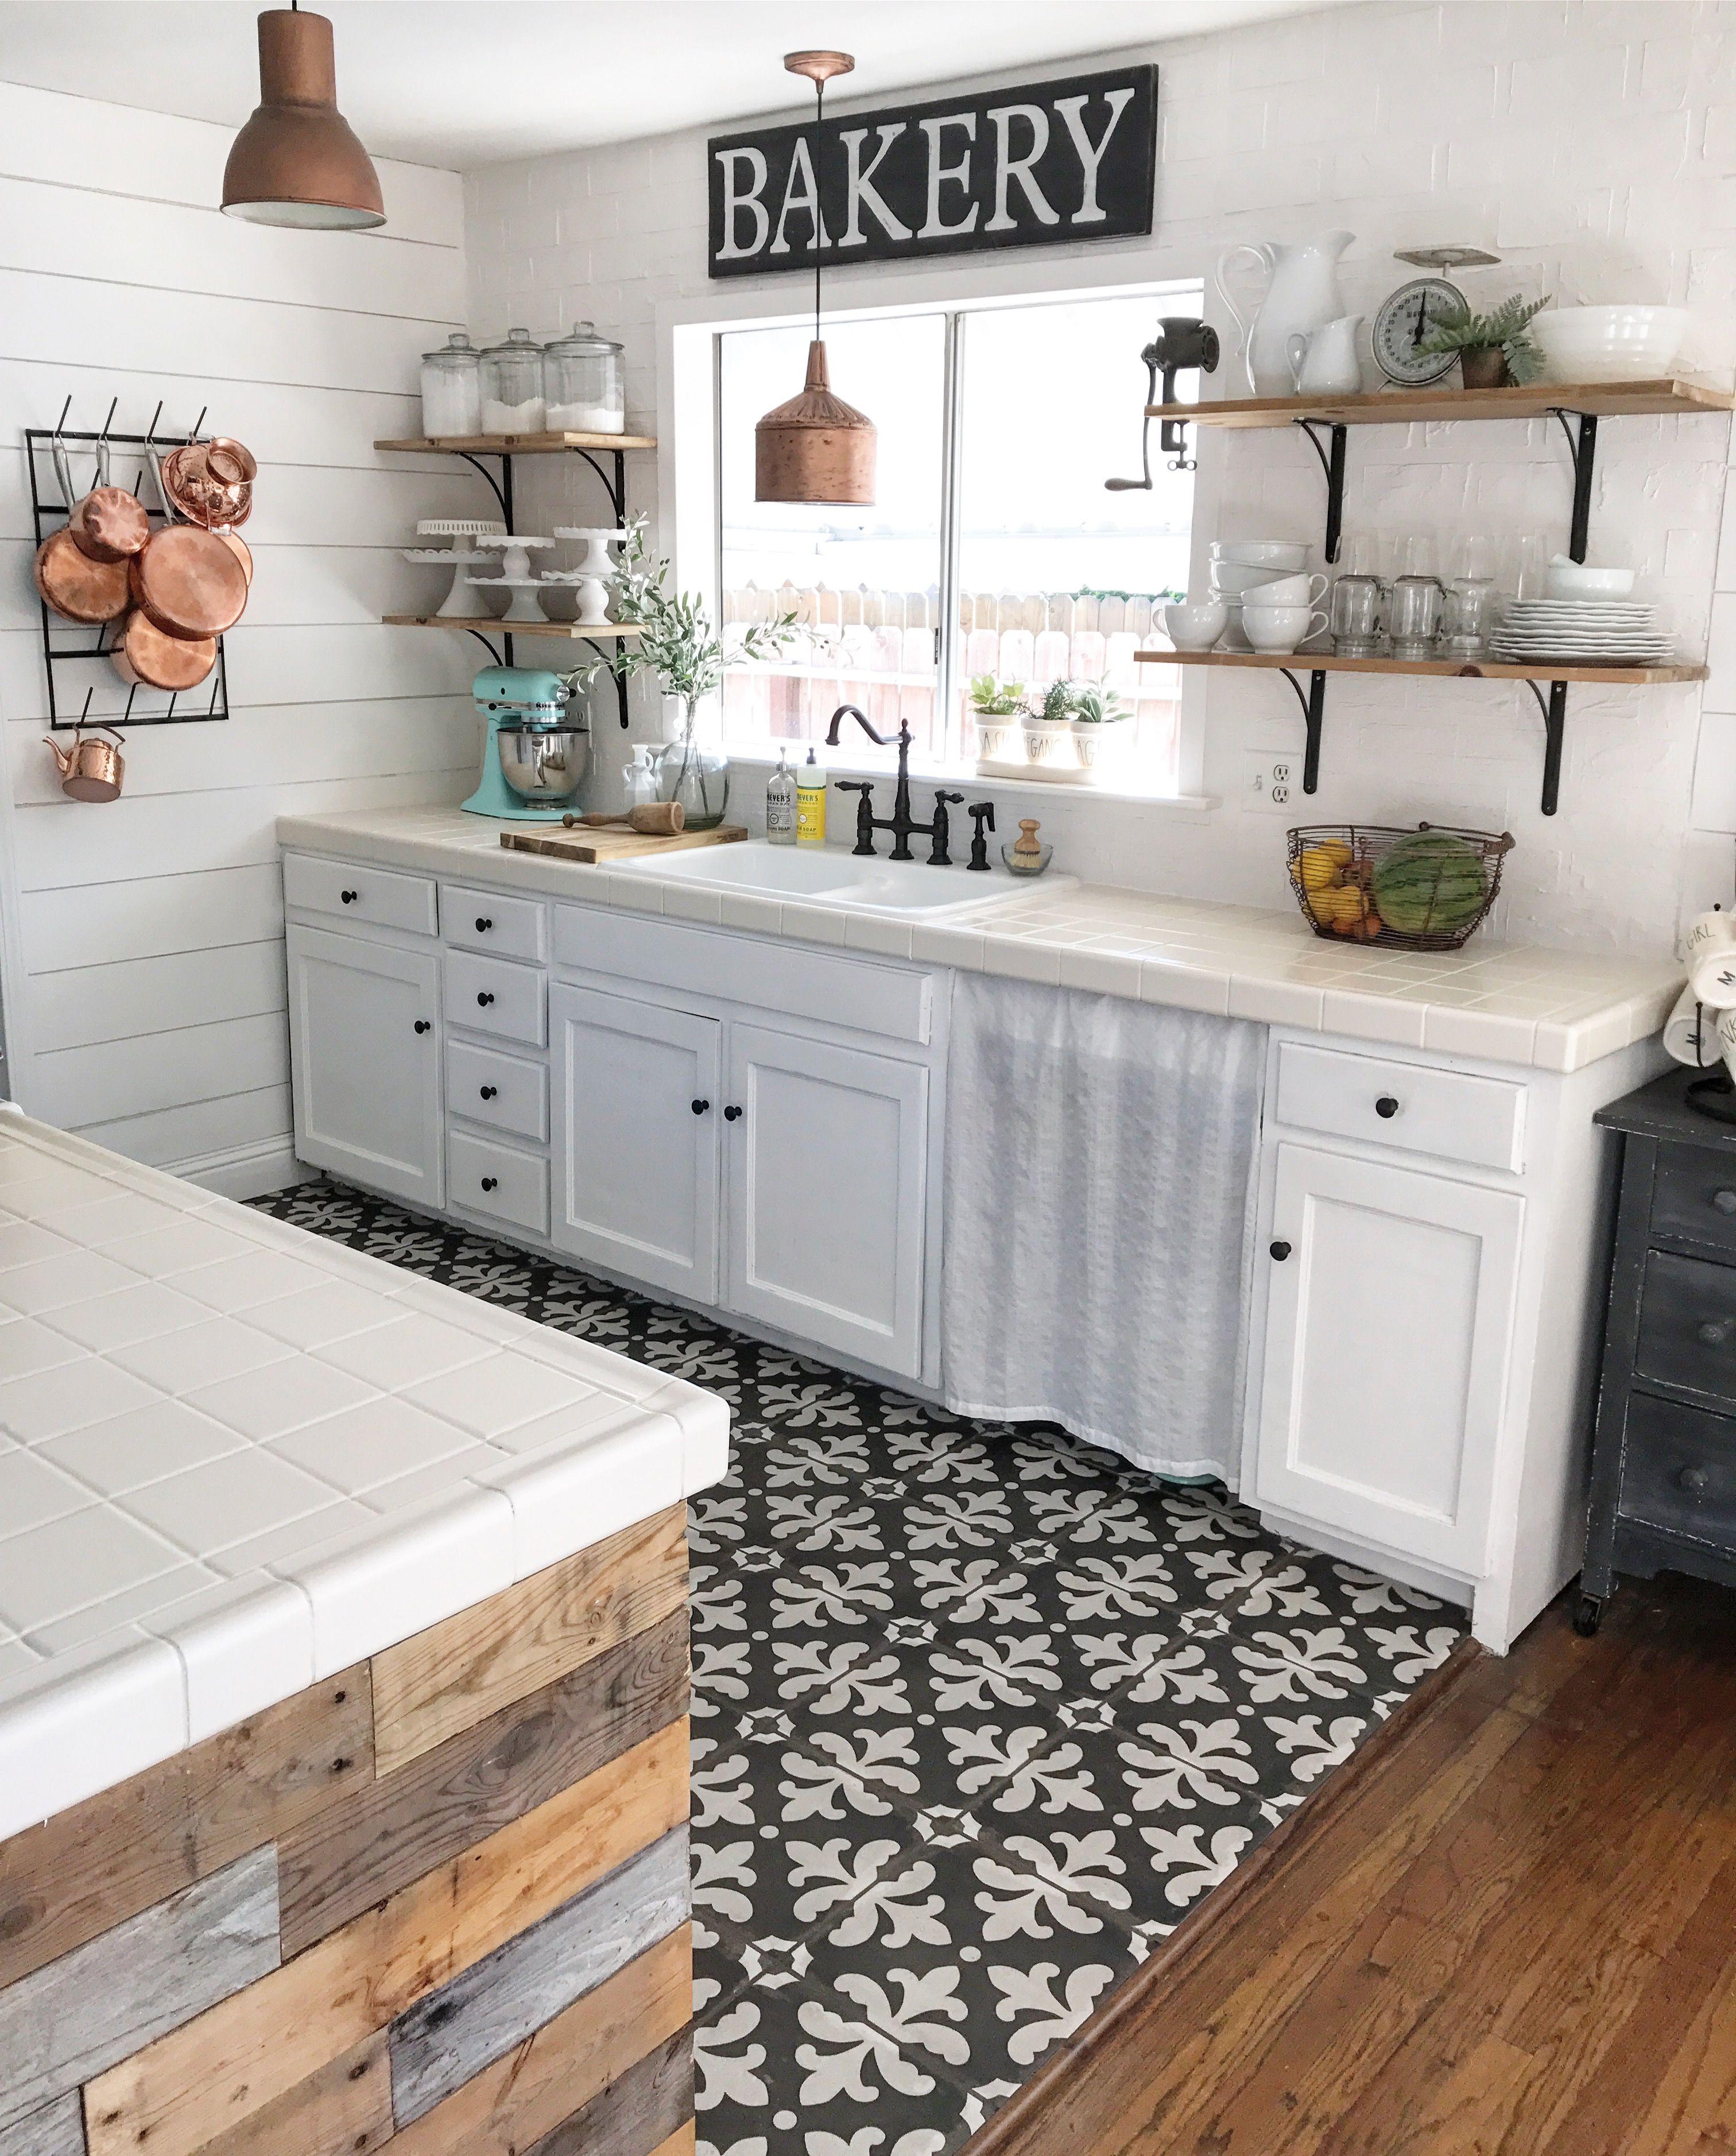 Black and white tile. Copper pans. Cottage kitchen